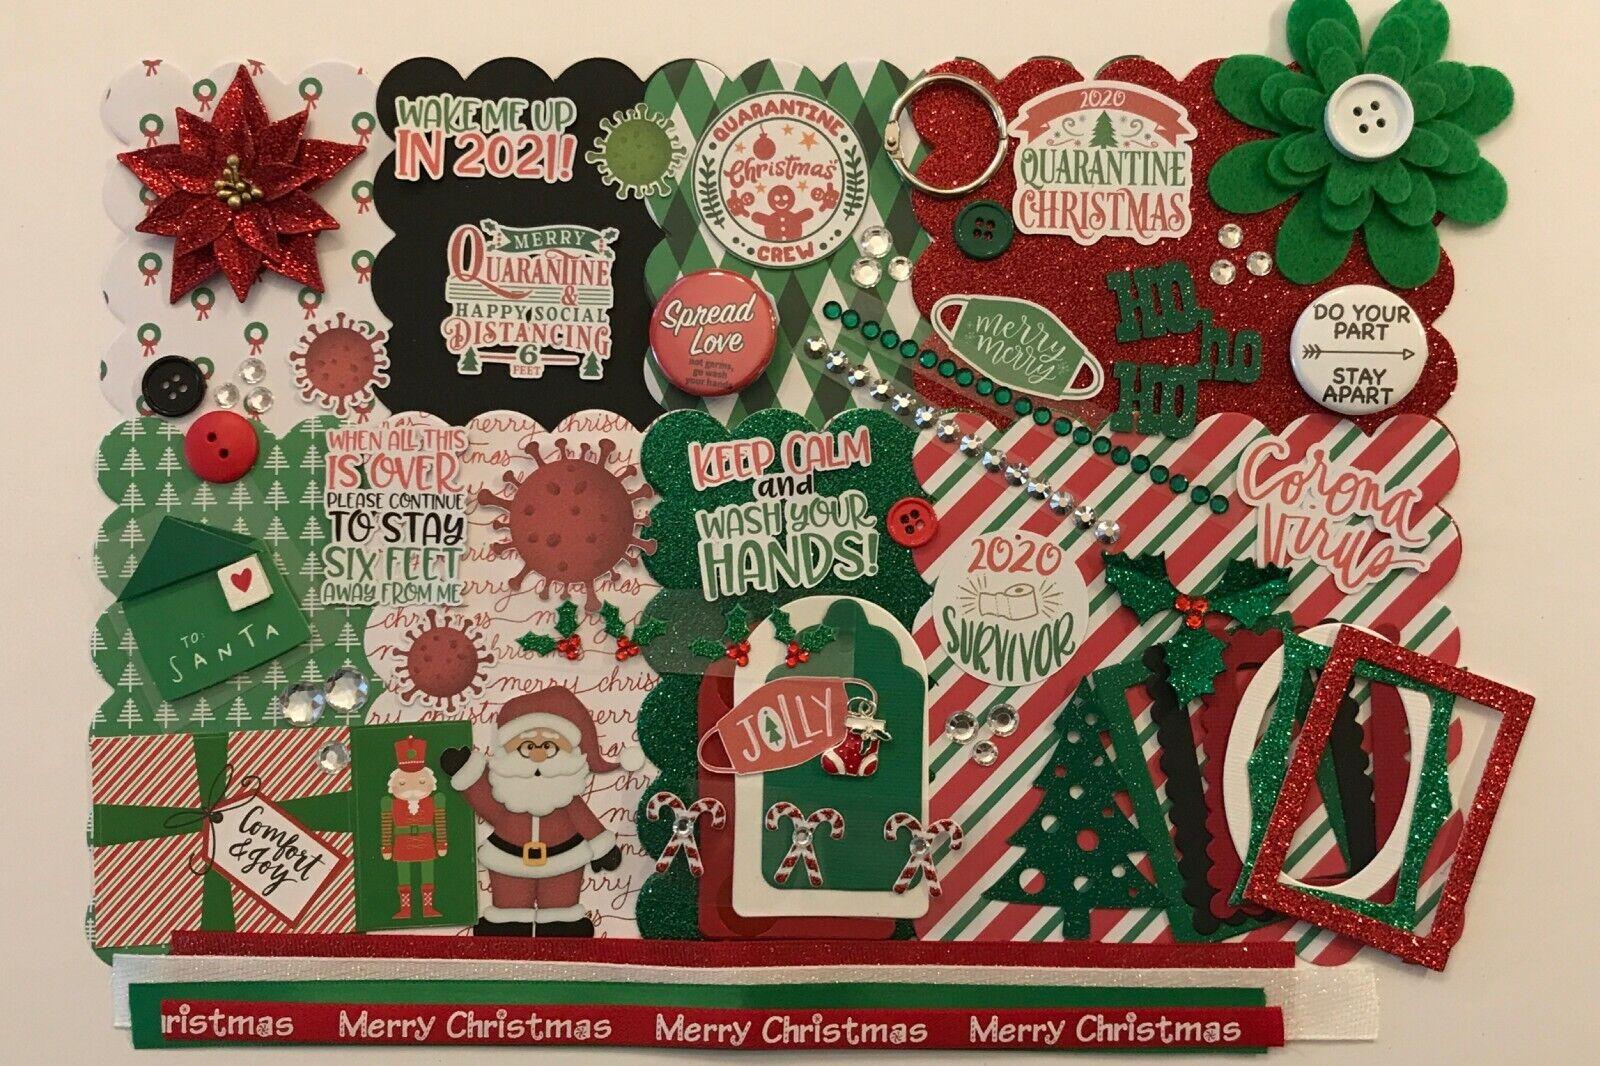 Quarantine Christmas Custom Chipboard Mini Book DIY Album Kit Scrapbook - $14.00